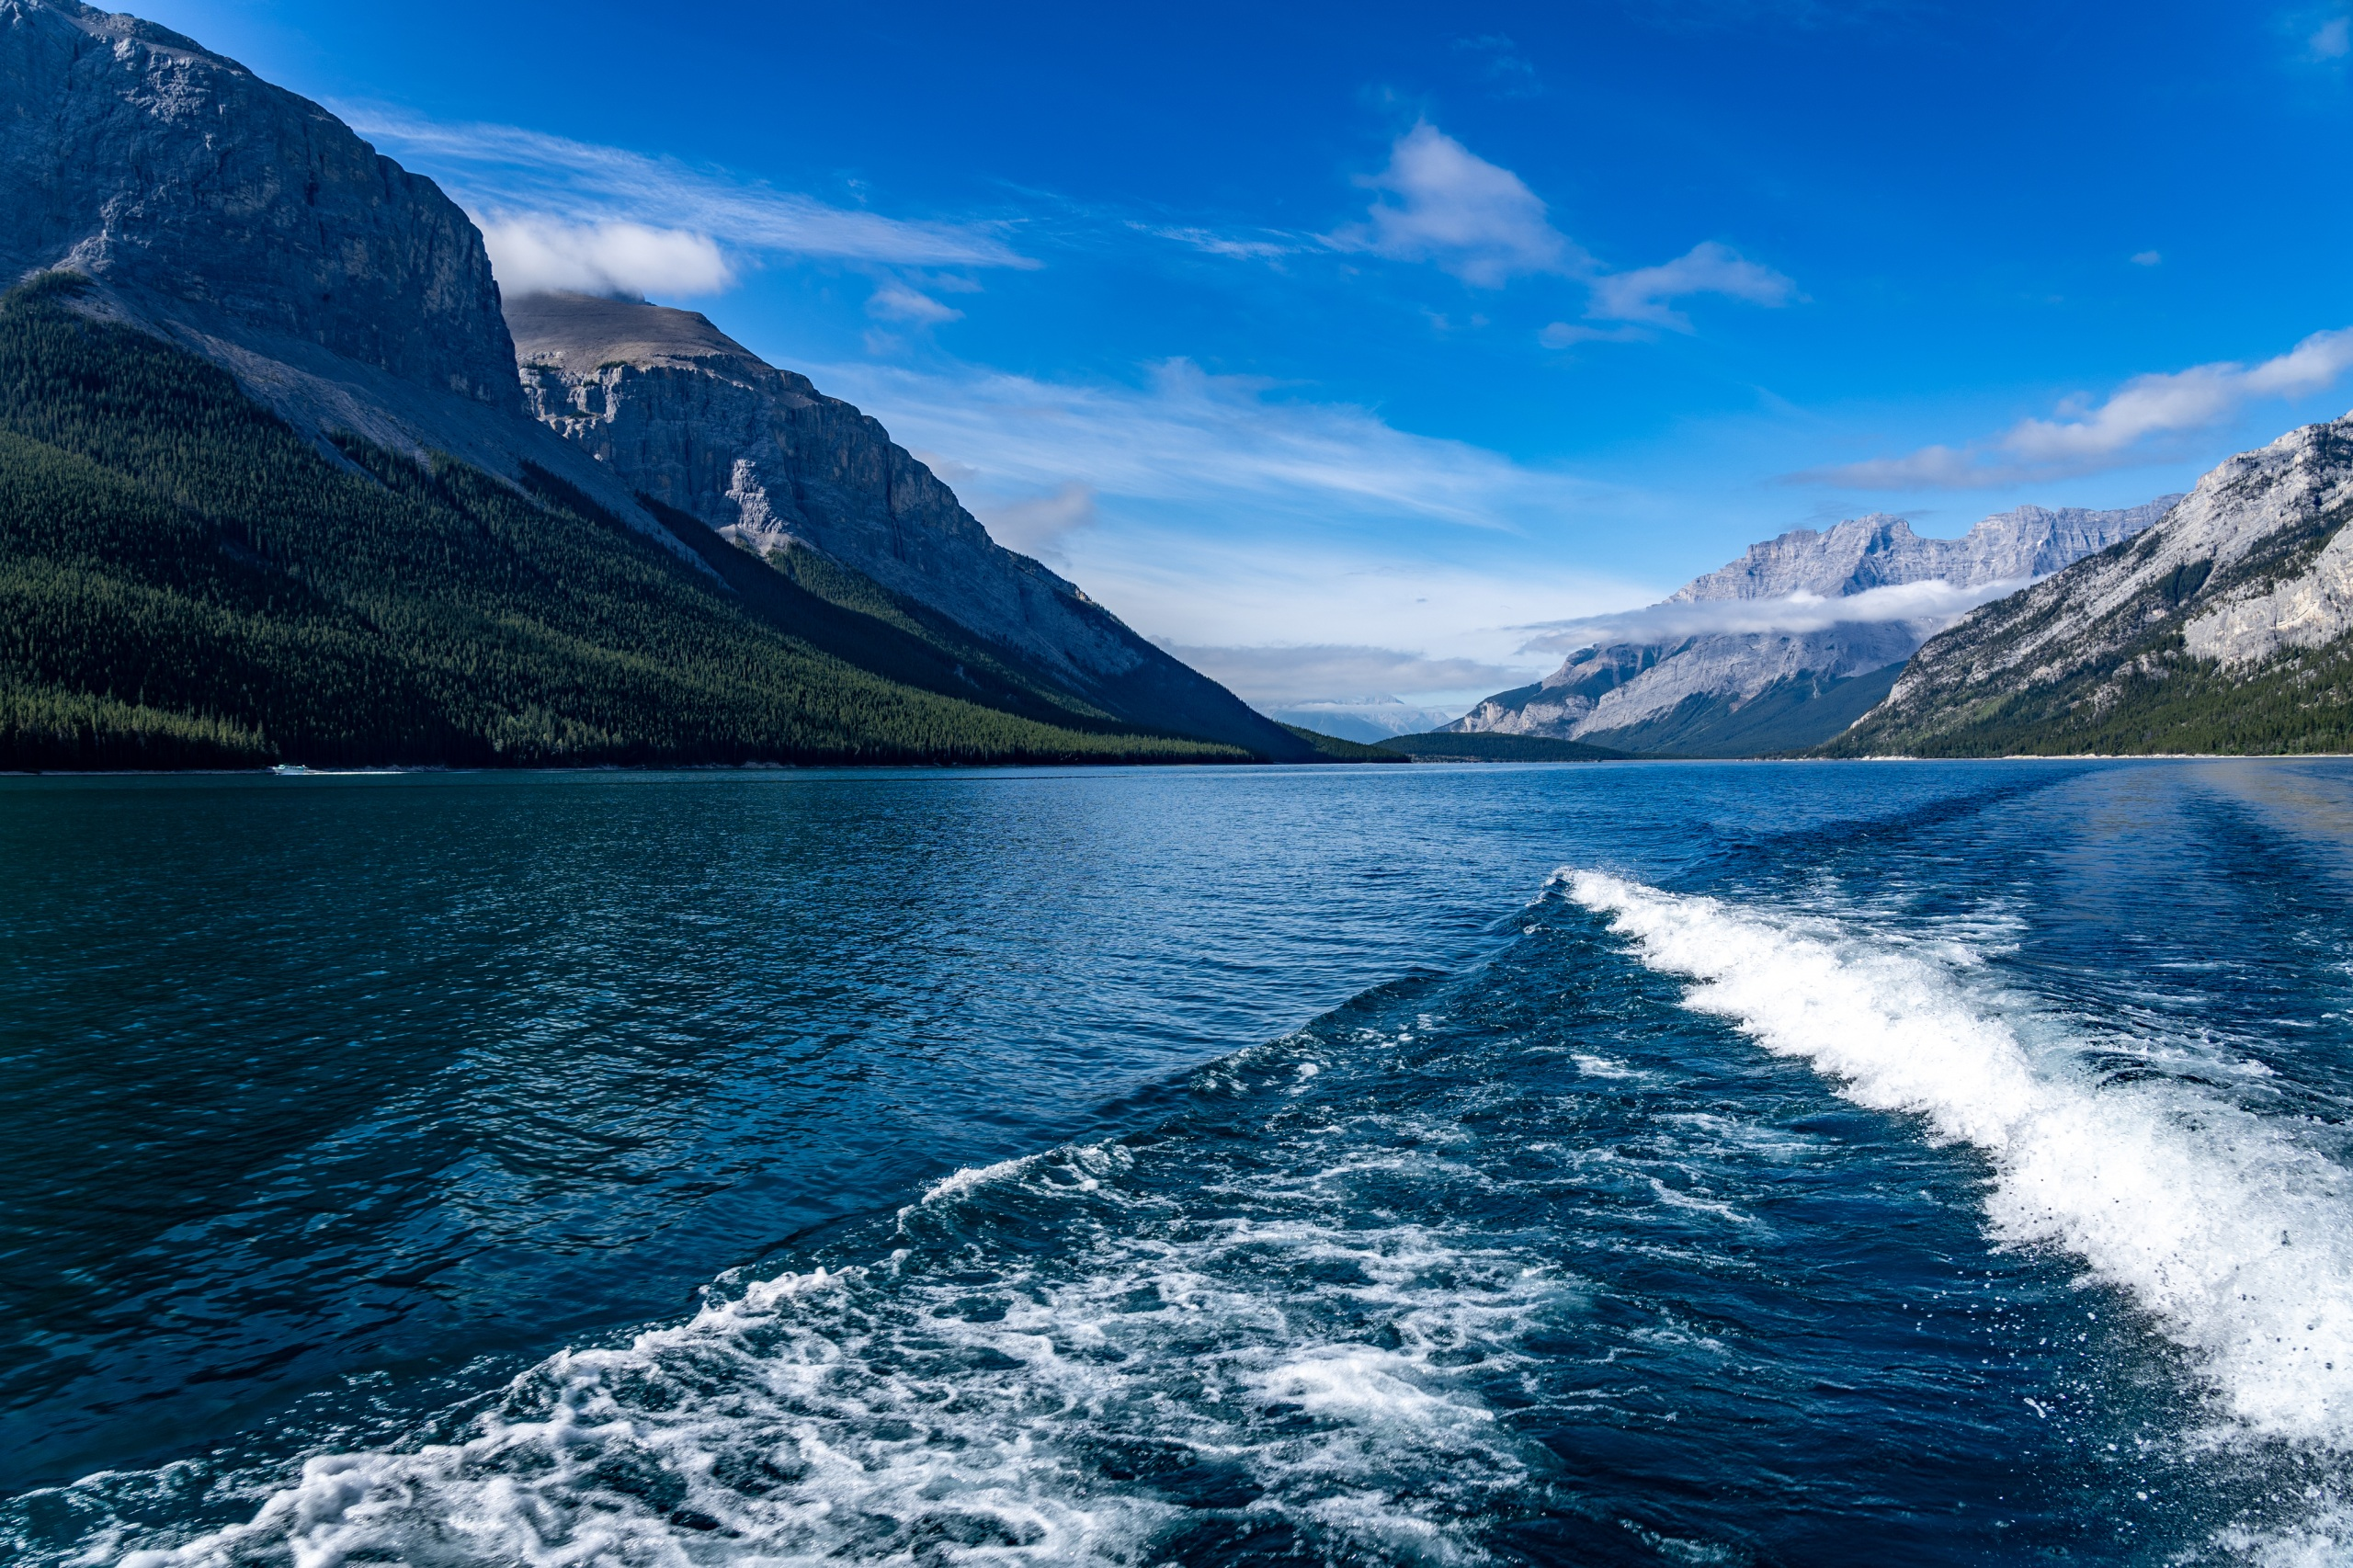 Картинки Канада Lake Minnewanka Горы Природа Волны Озеро 2560x1706 гора